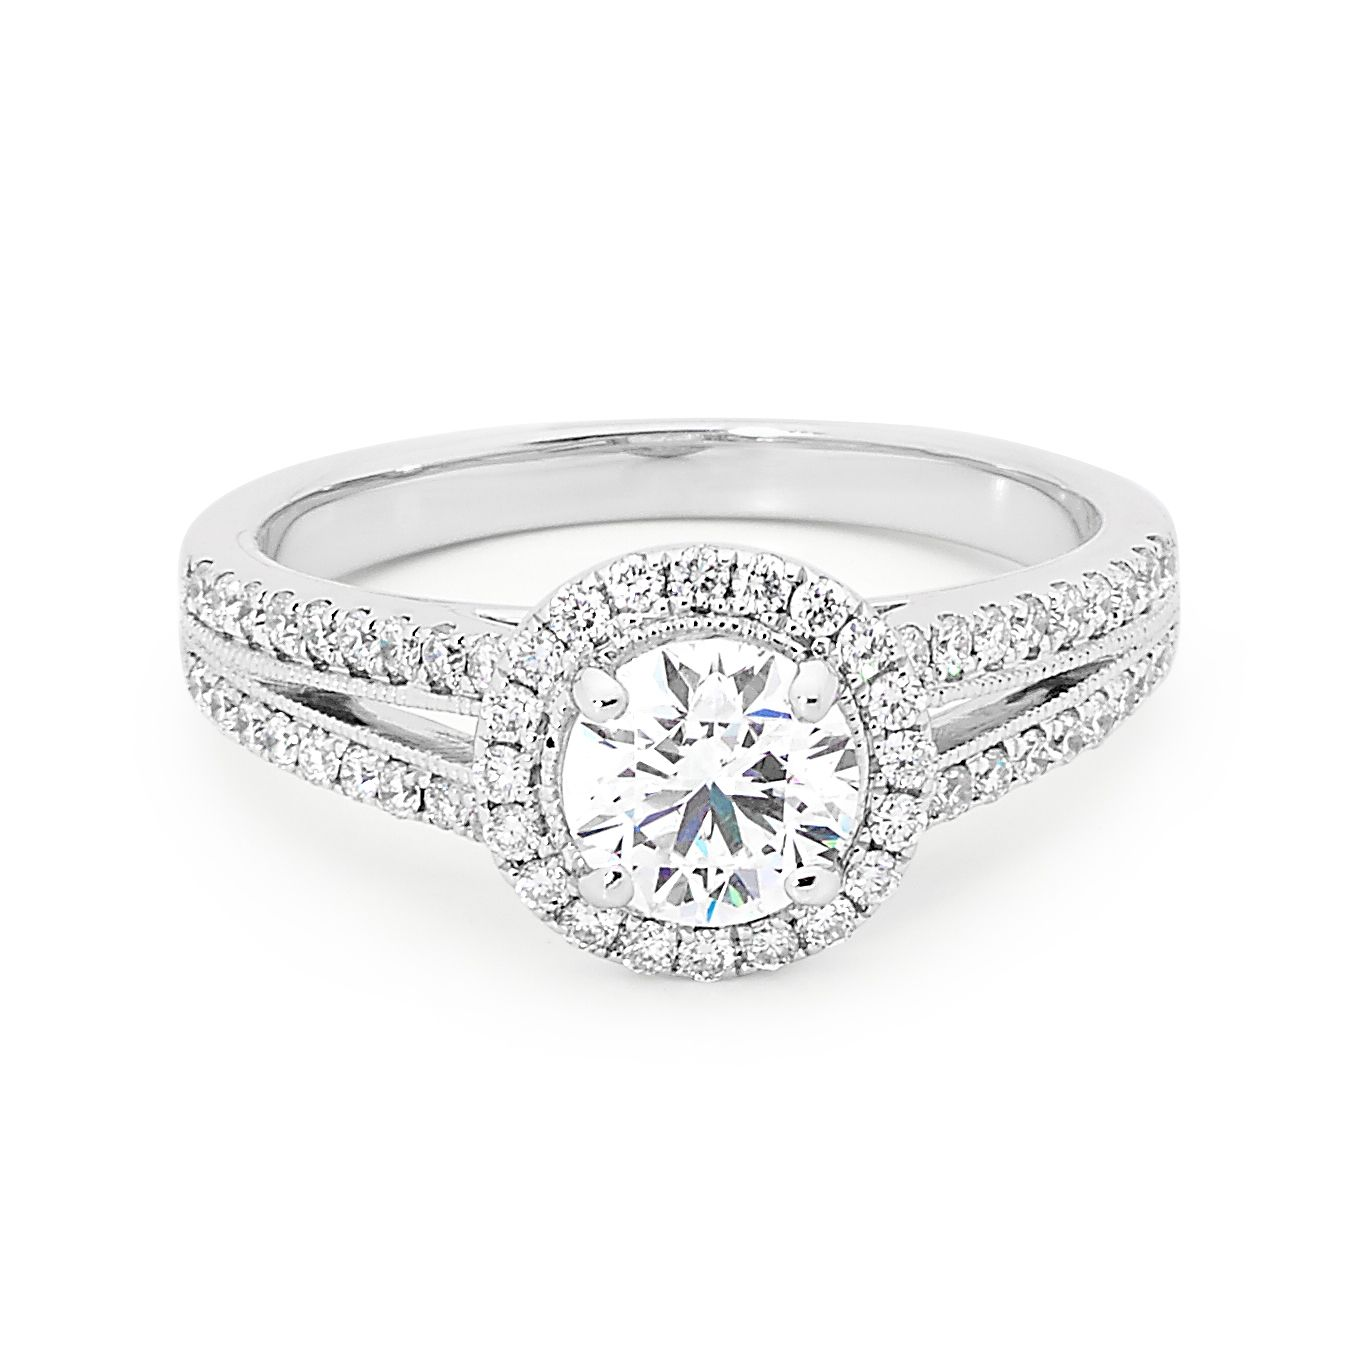 895517fdf Round brilliant cut halo diamond engagement ring with split diamond  shoulders. #love #style #white #diamond #ring #gold #jewellery  #diamondsinternational ...